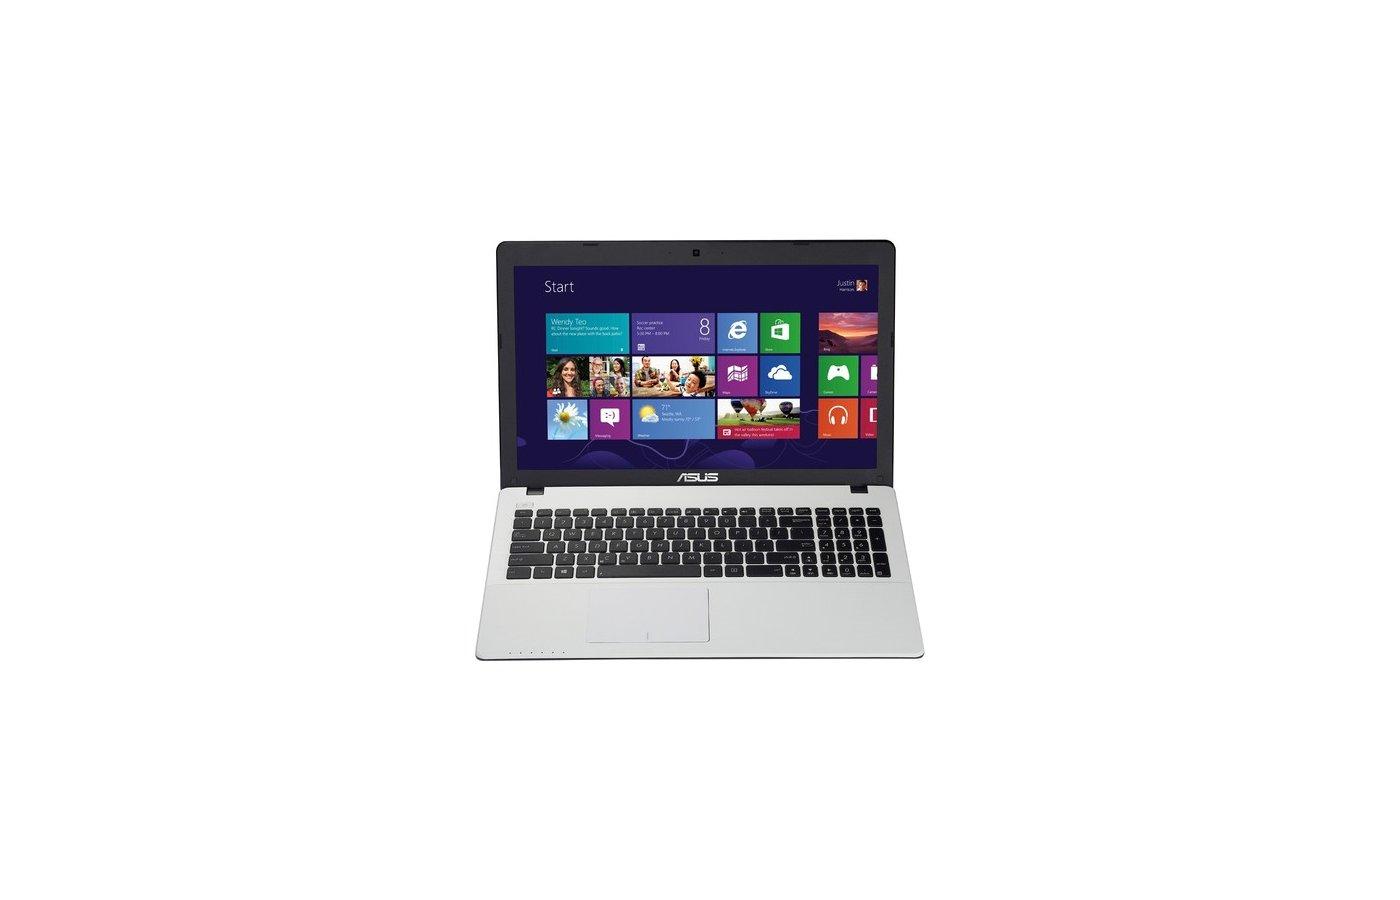 Ноутбук ASUS X550ZA-XO013H /90NB07A2-M00130/ AMD A8 7200/4Gb/1Tb/DVDRW/15.6/WiFi/Win8